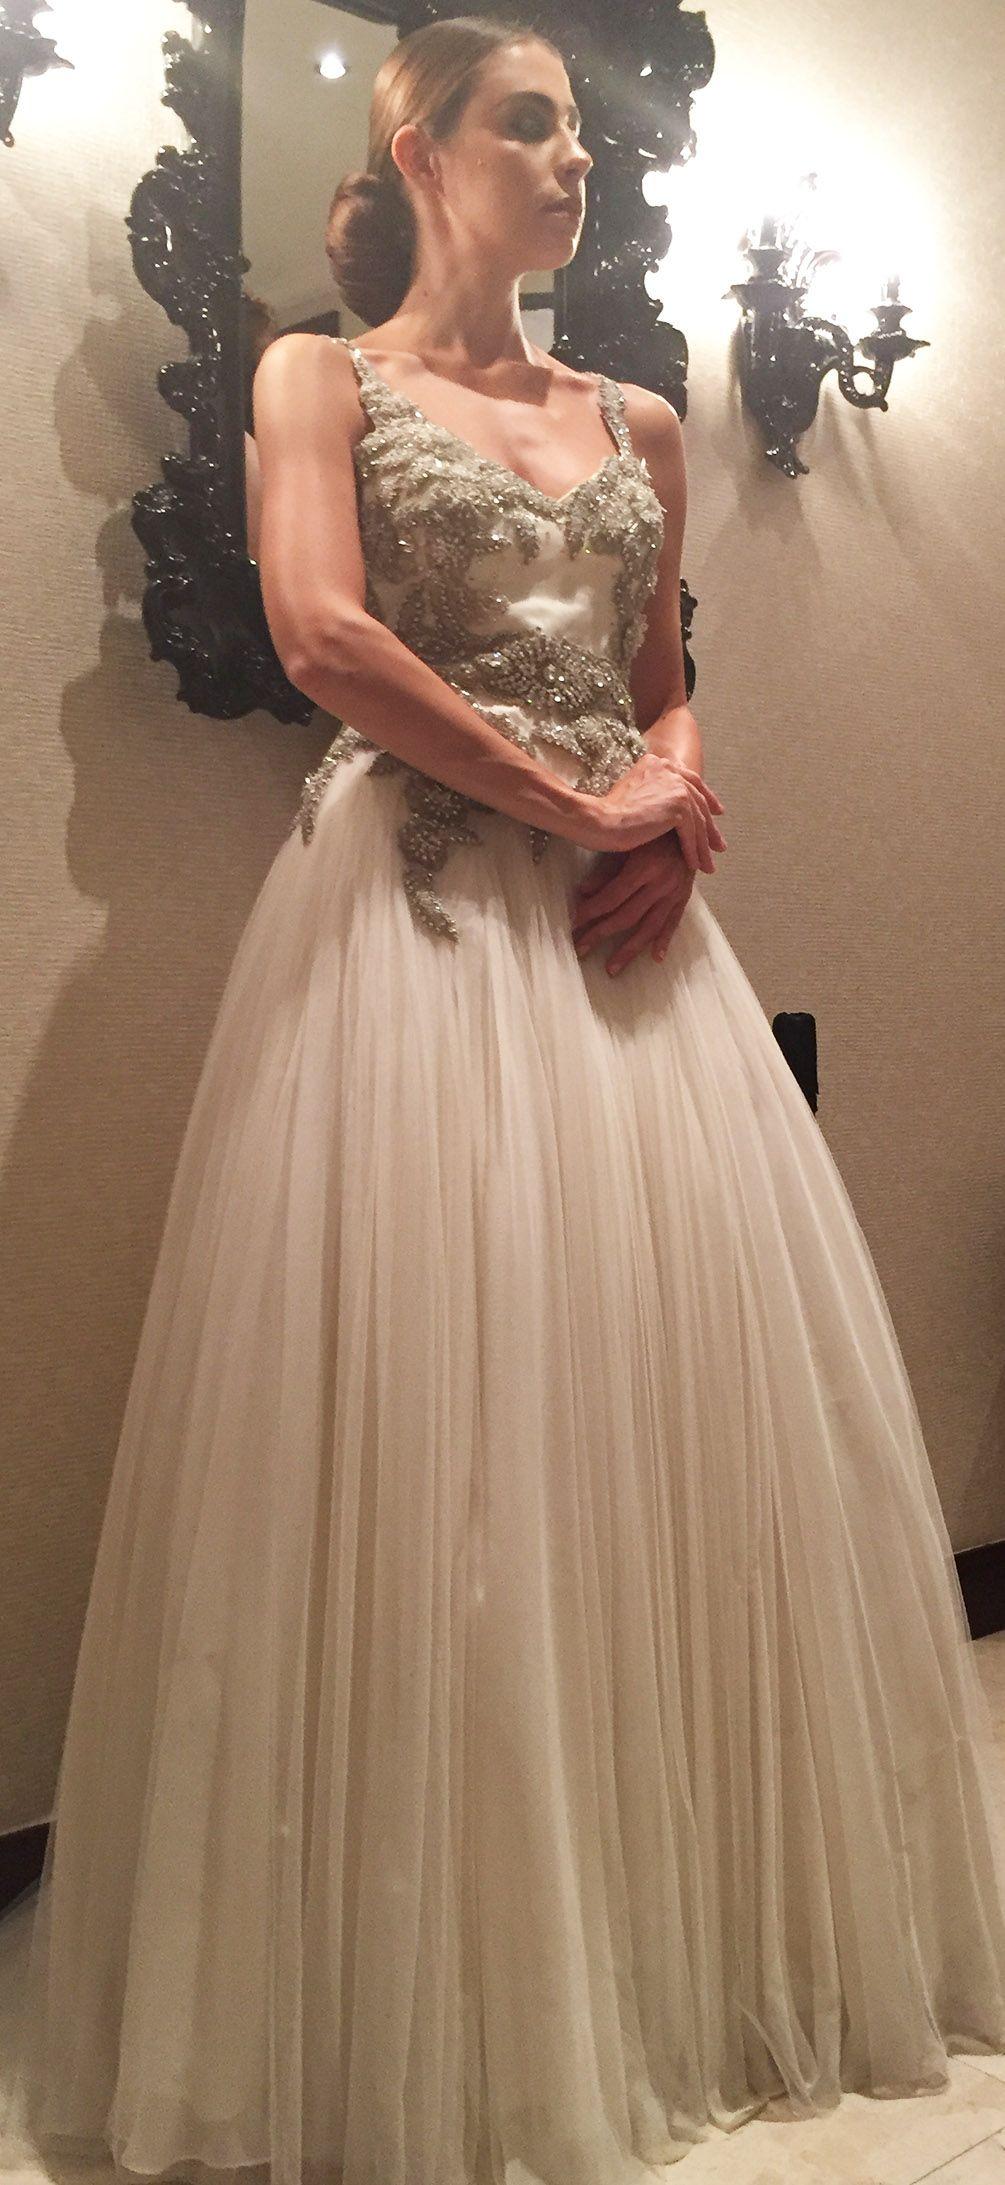 Wedding dress shops in deira dubai  Mahmoud Adra mahmoudadra on Pinterest